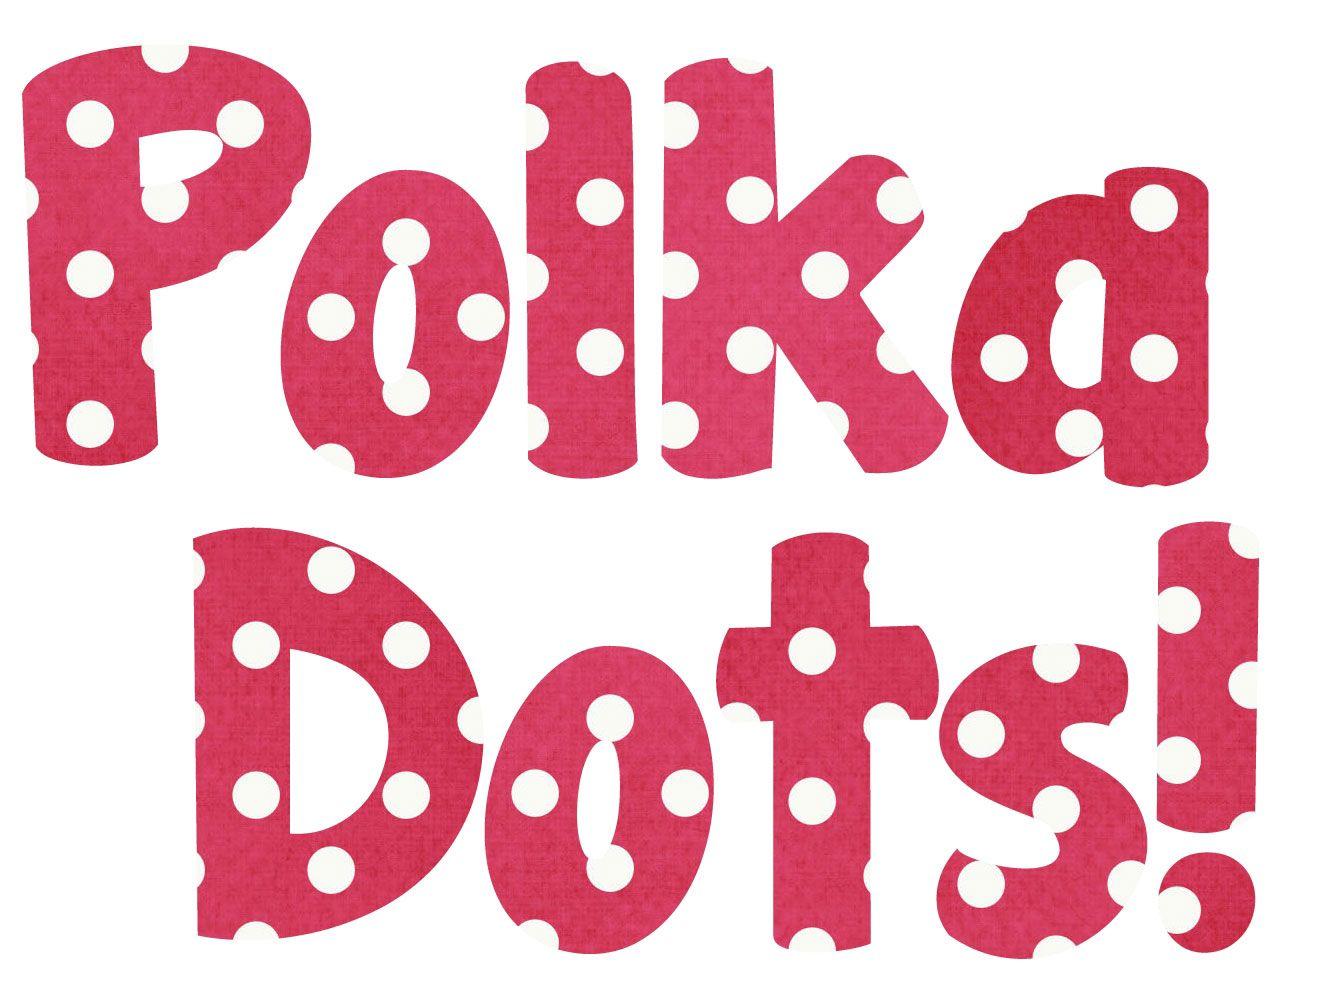 Free Dark Pink Polka Dot Bubble Letter Alphabet Graphics